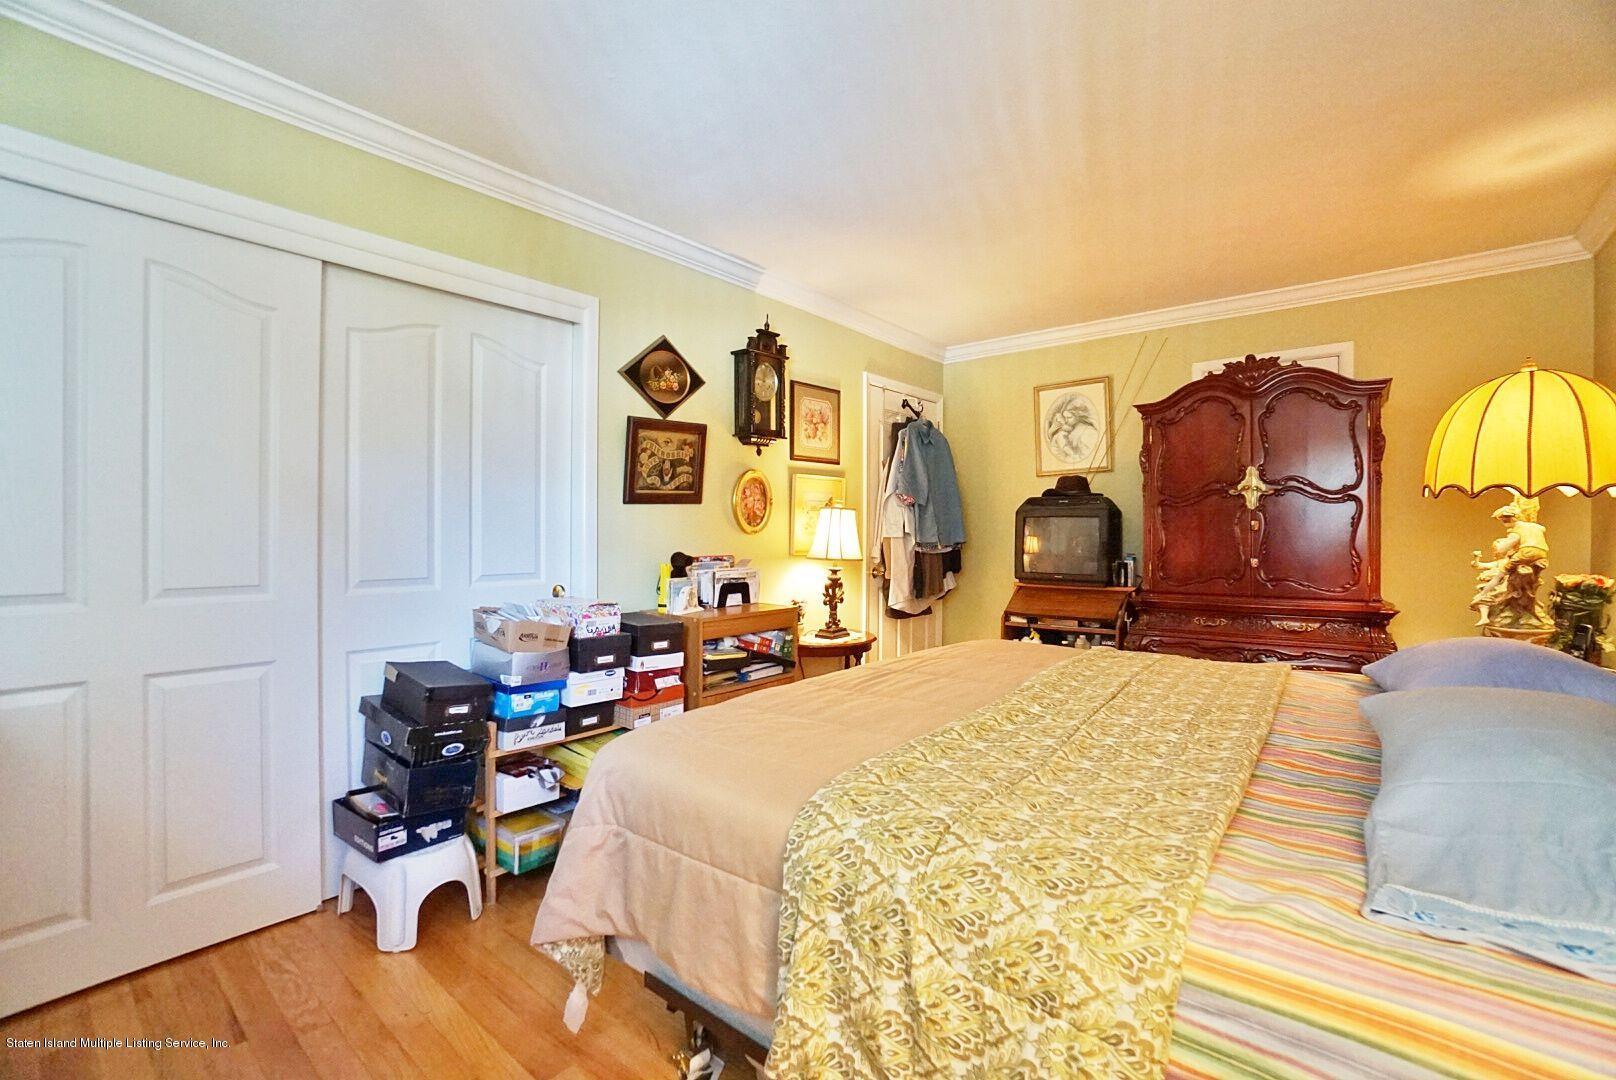 Single Family - Detached 283 Holdridge Avenue  Staten Island, NY 10312, MLS-1130000-15